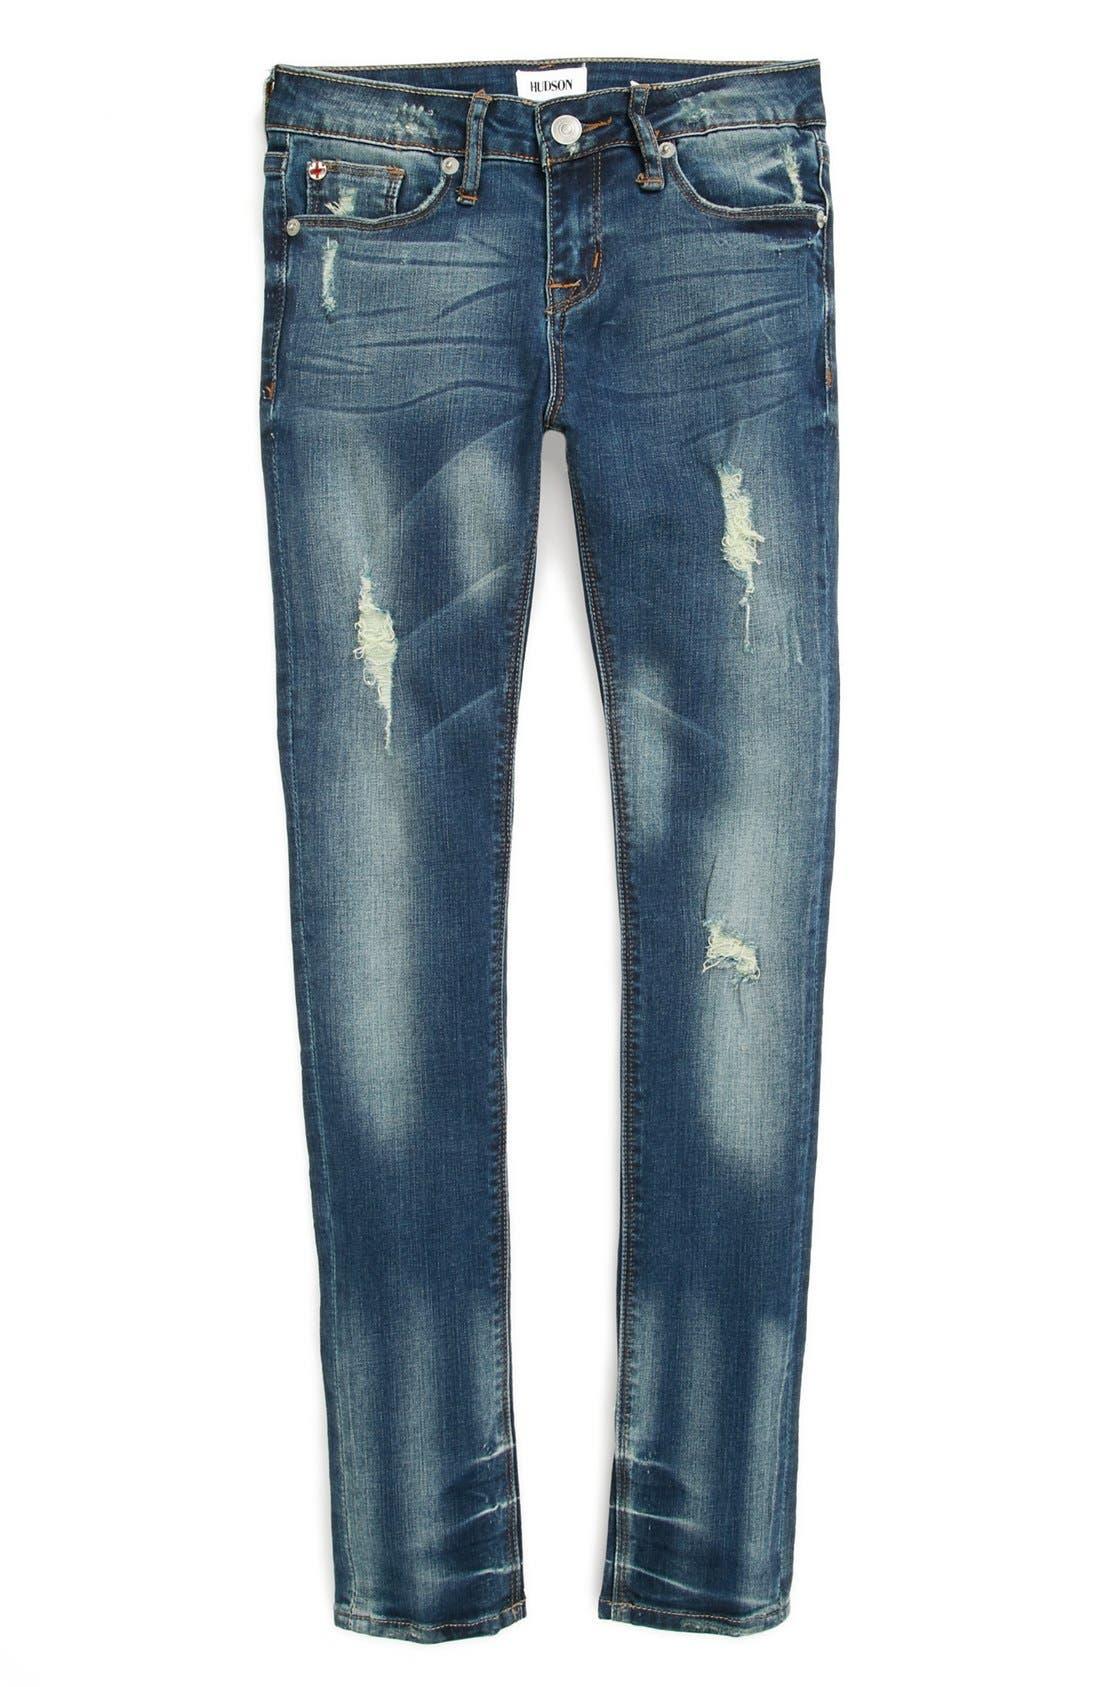 Alternate Image 1 Selected - Hudson Kids 'Dolly' Skinny Jeans (Big Girls)